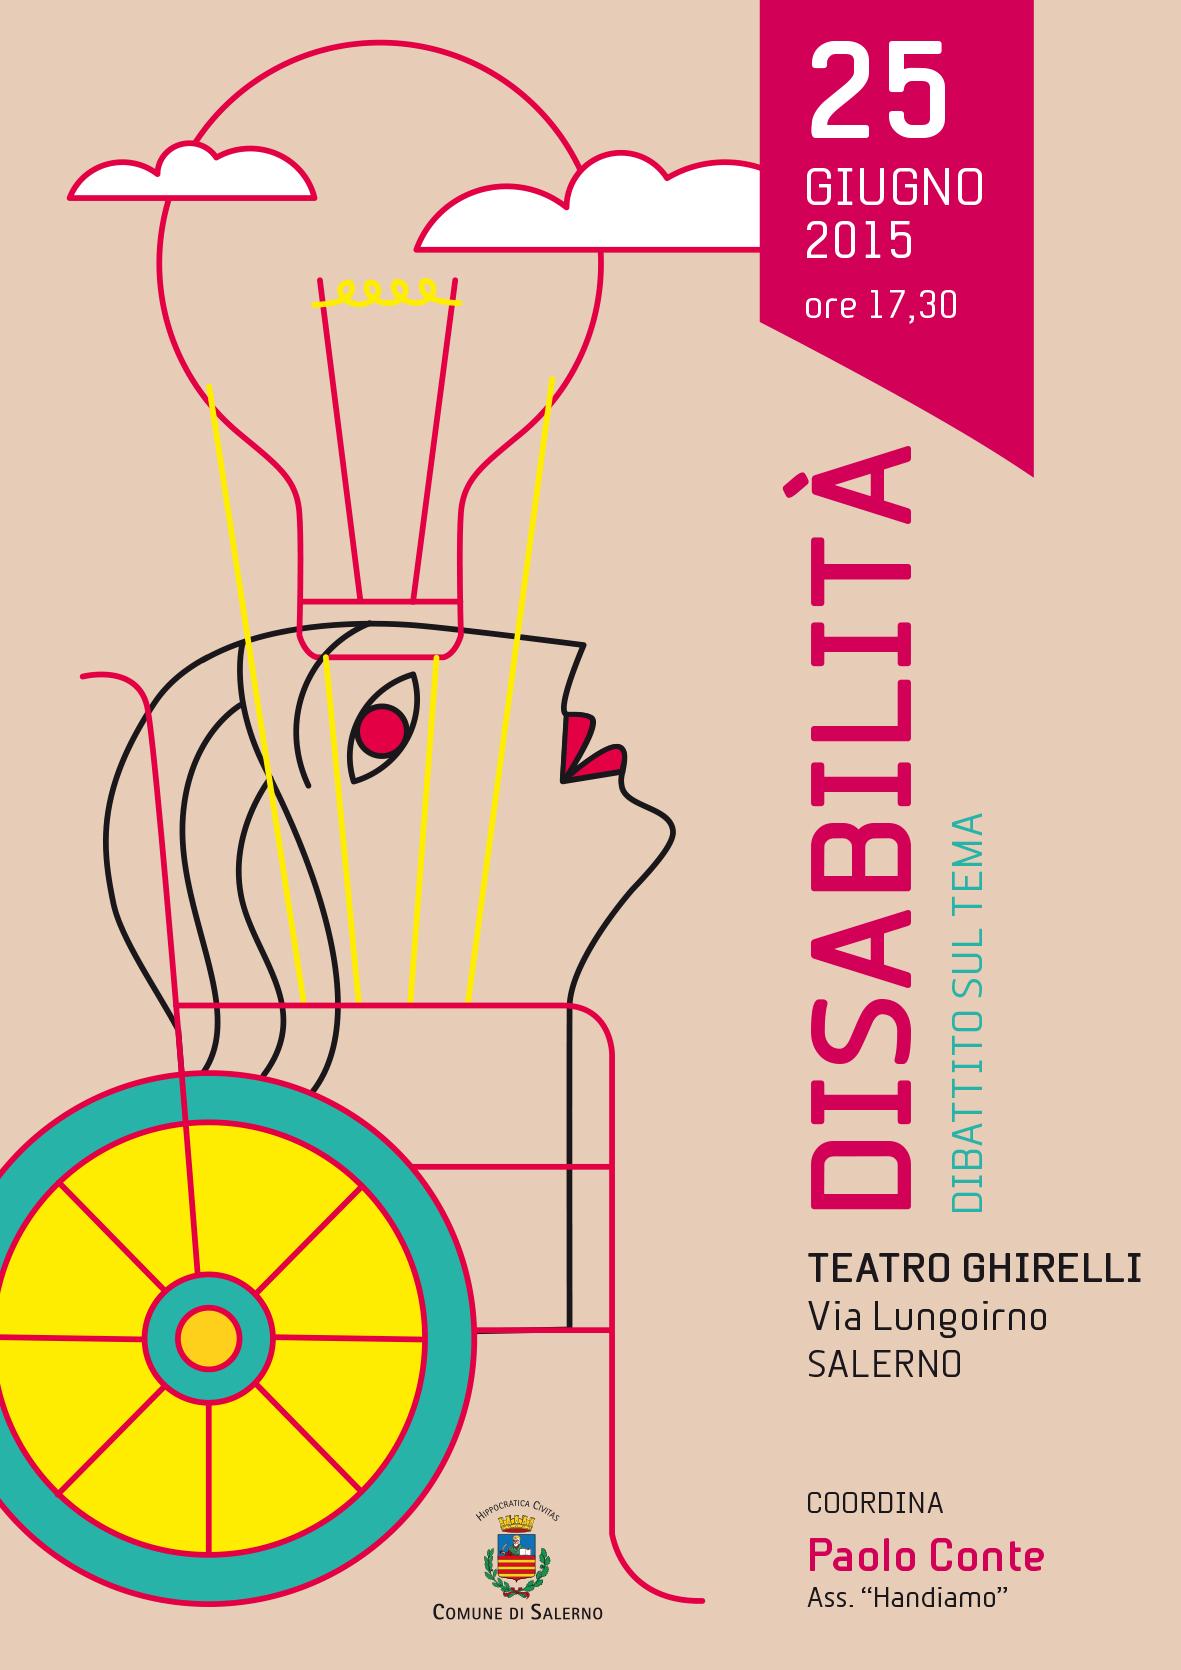 M2236 Alexa Disabilità Evento_Loc_DEF.indd